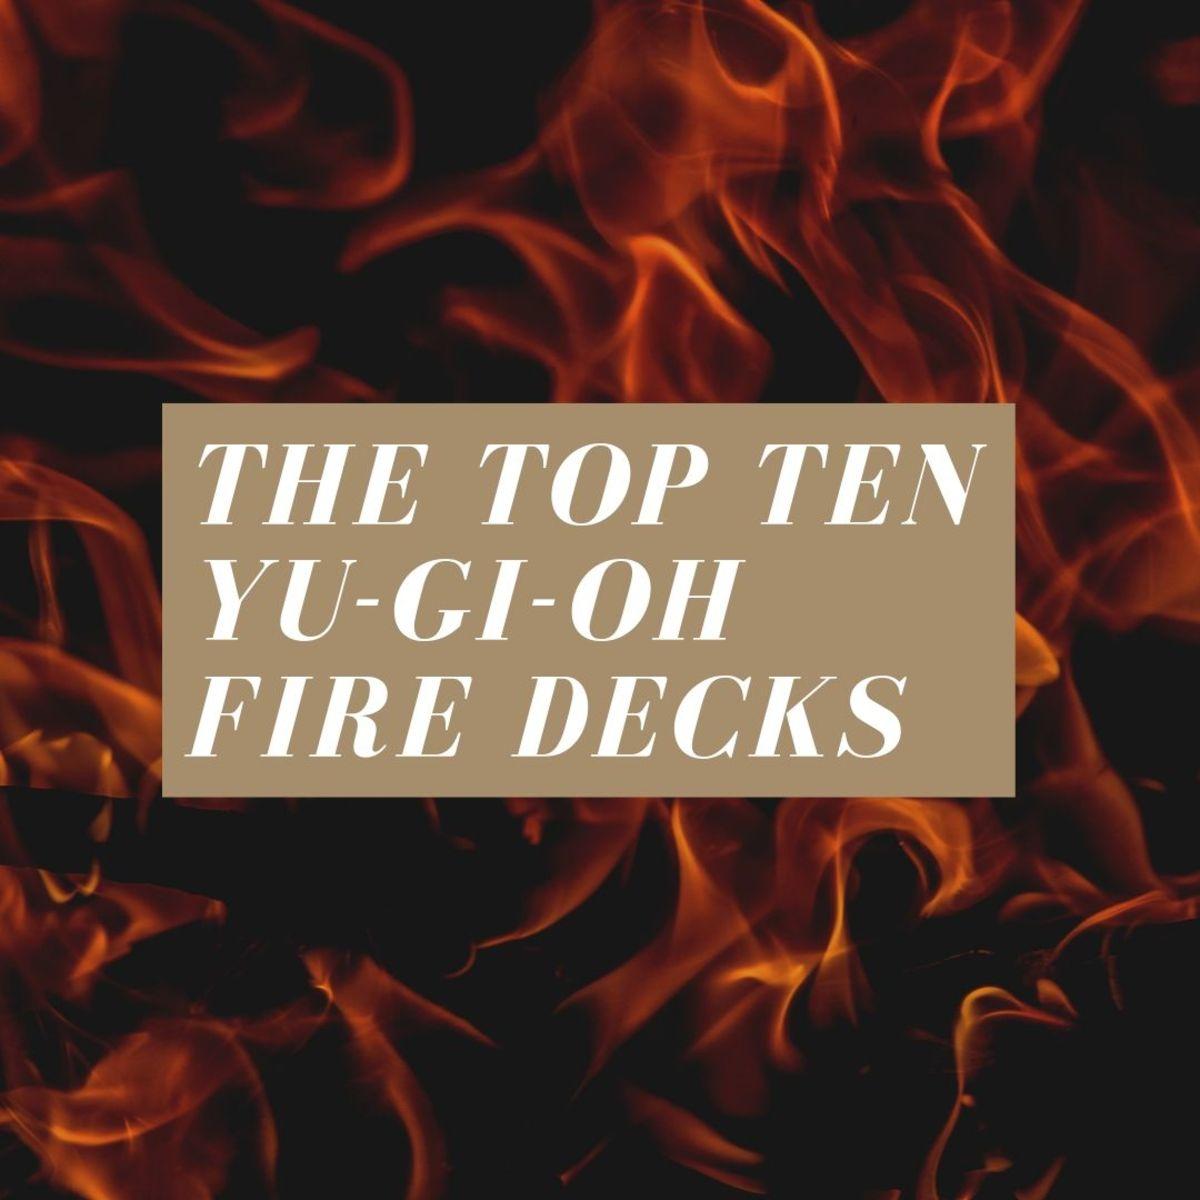 The Ten Best Yu-Gi-Oh Fire Decks